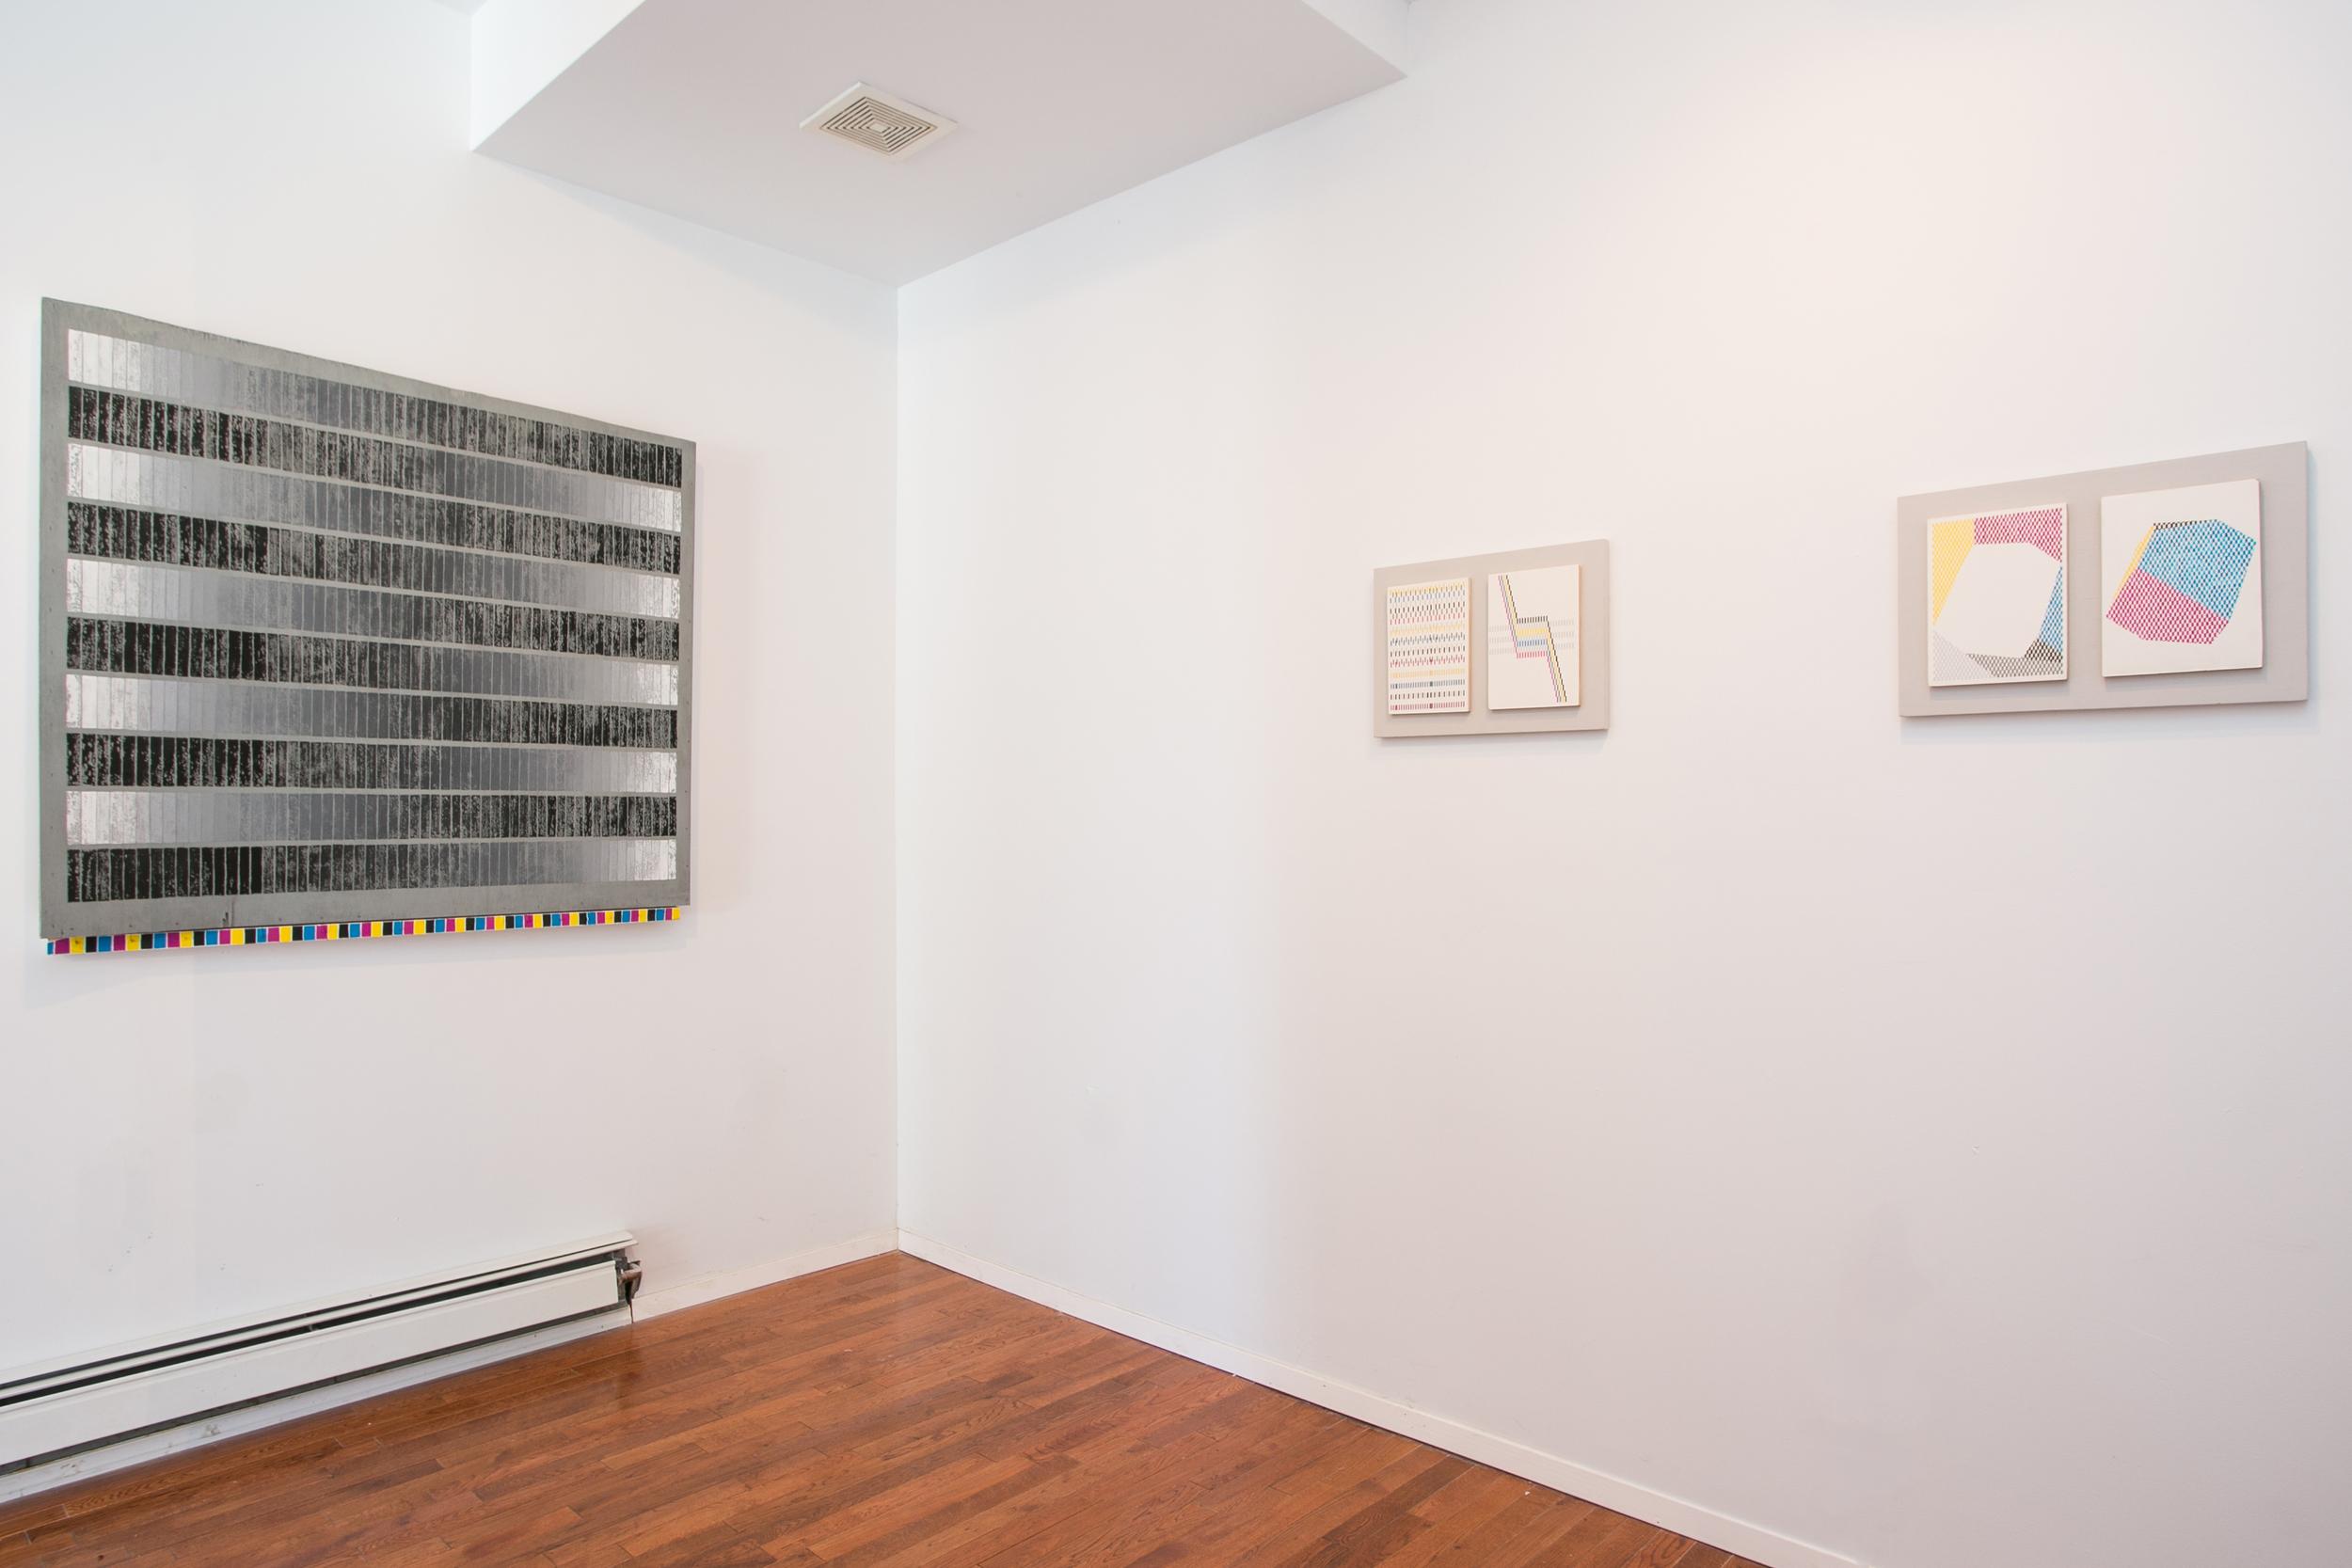 Installation view: Vanessa Hodgkinson, P R E I M A G E, Peninsula Art Space, Brooklyn, New York, 2014